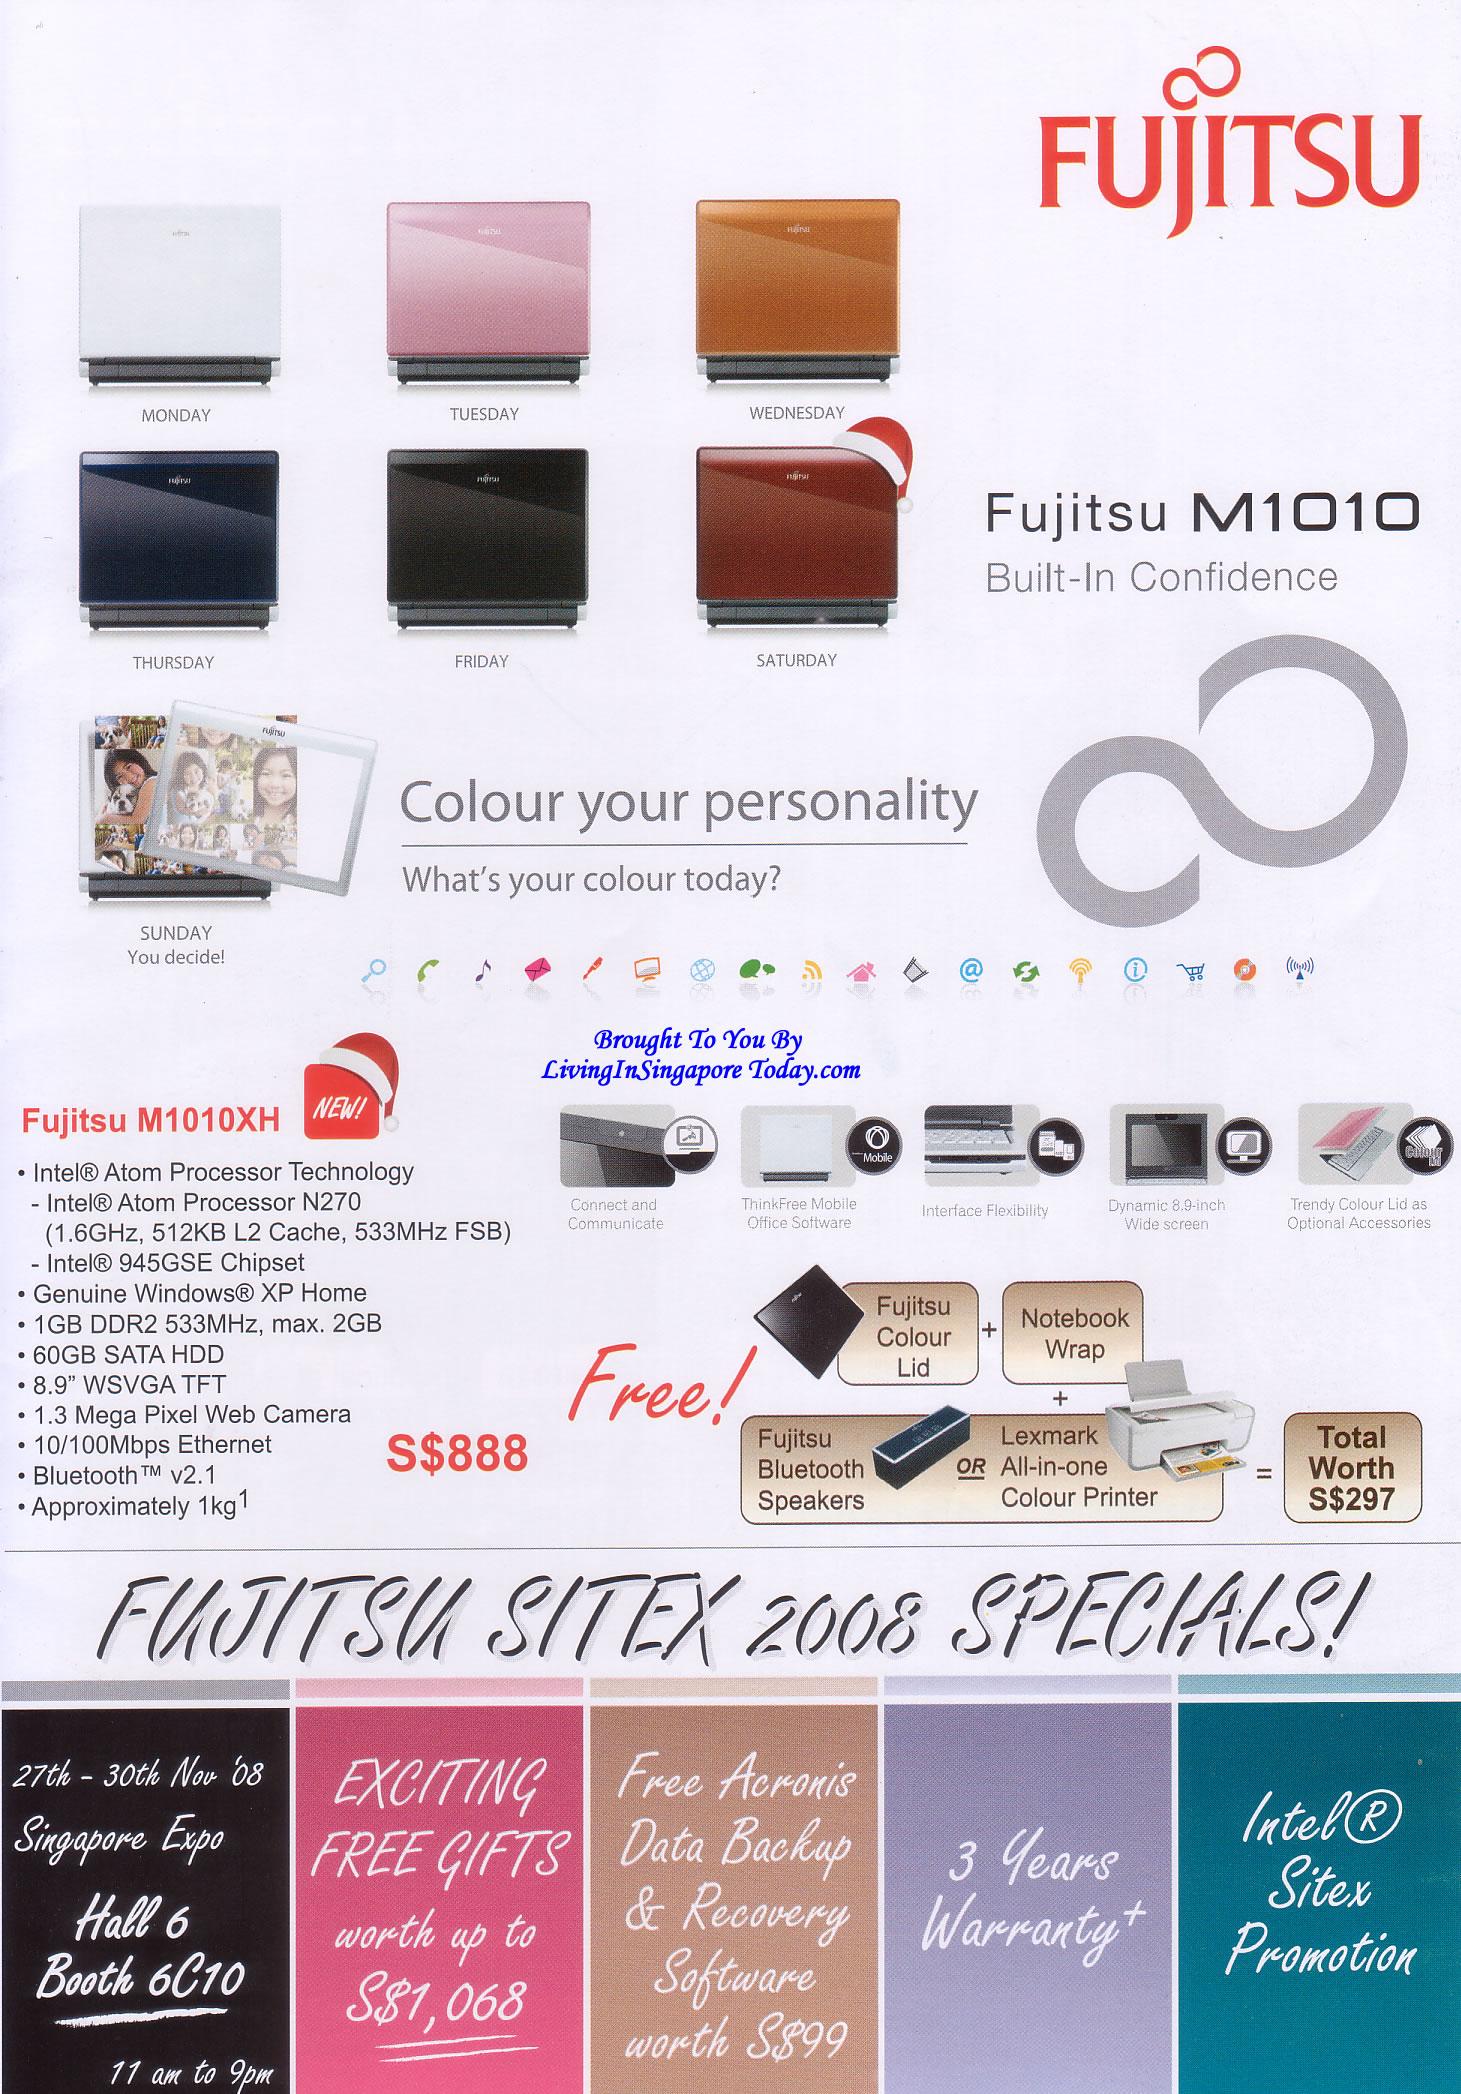 Sitex 2008 price list image brochure of Fujitsu M1010